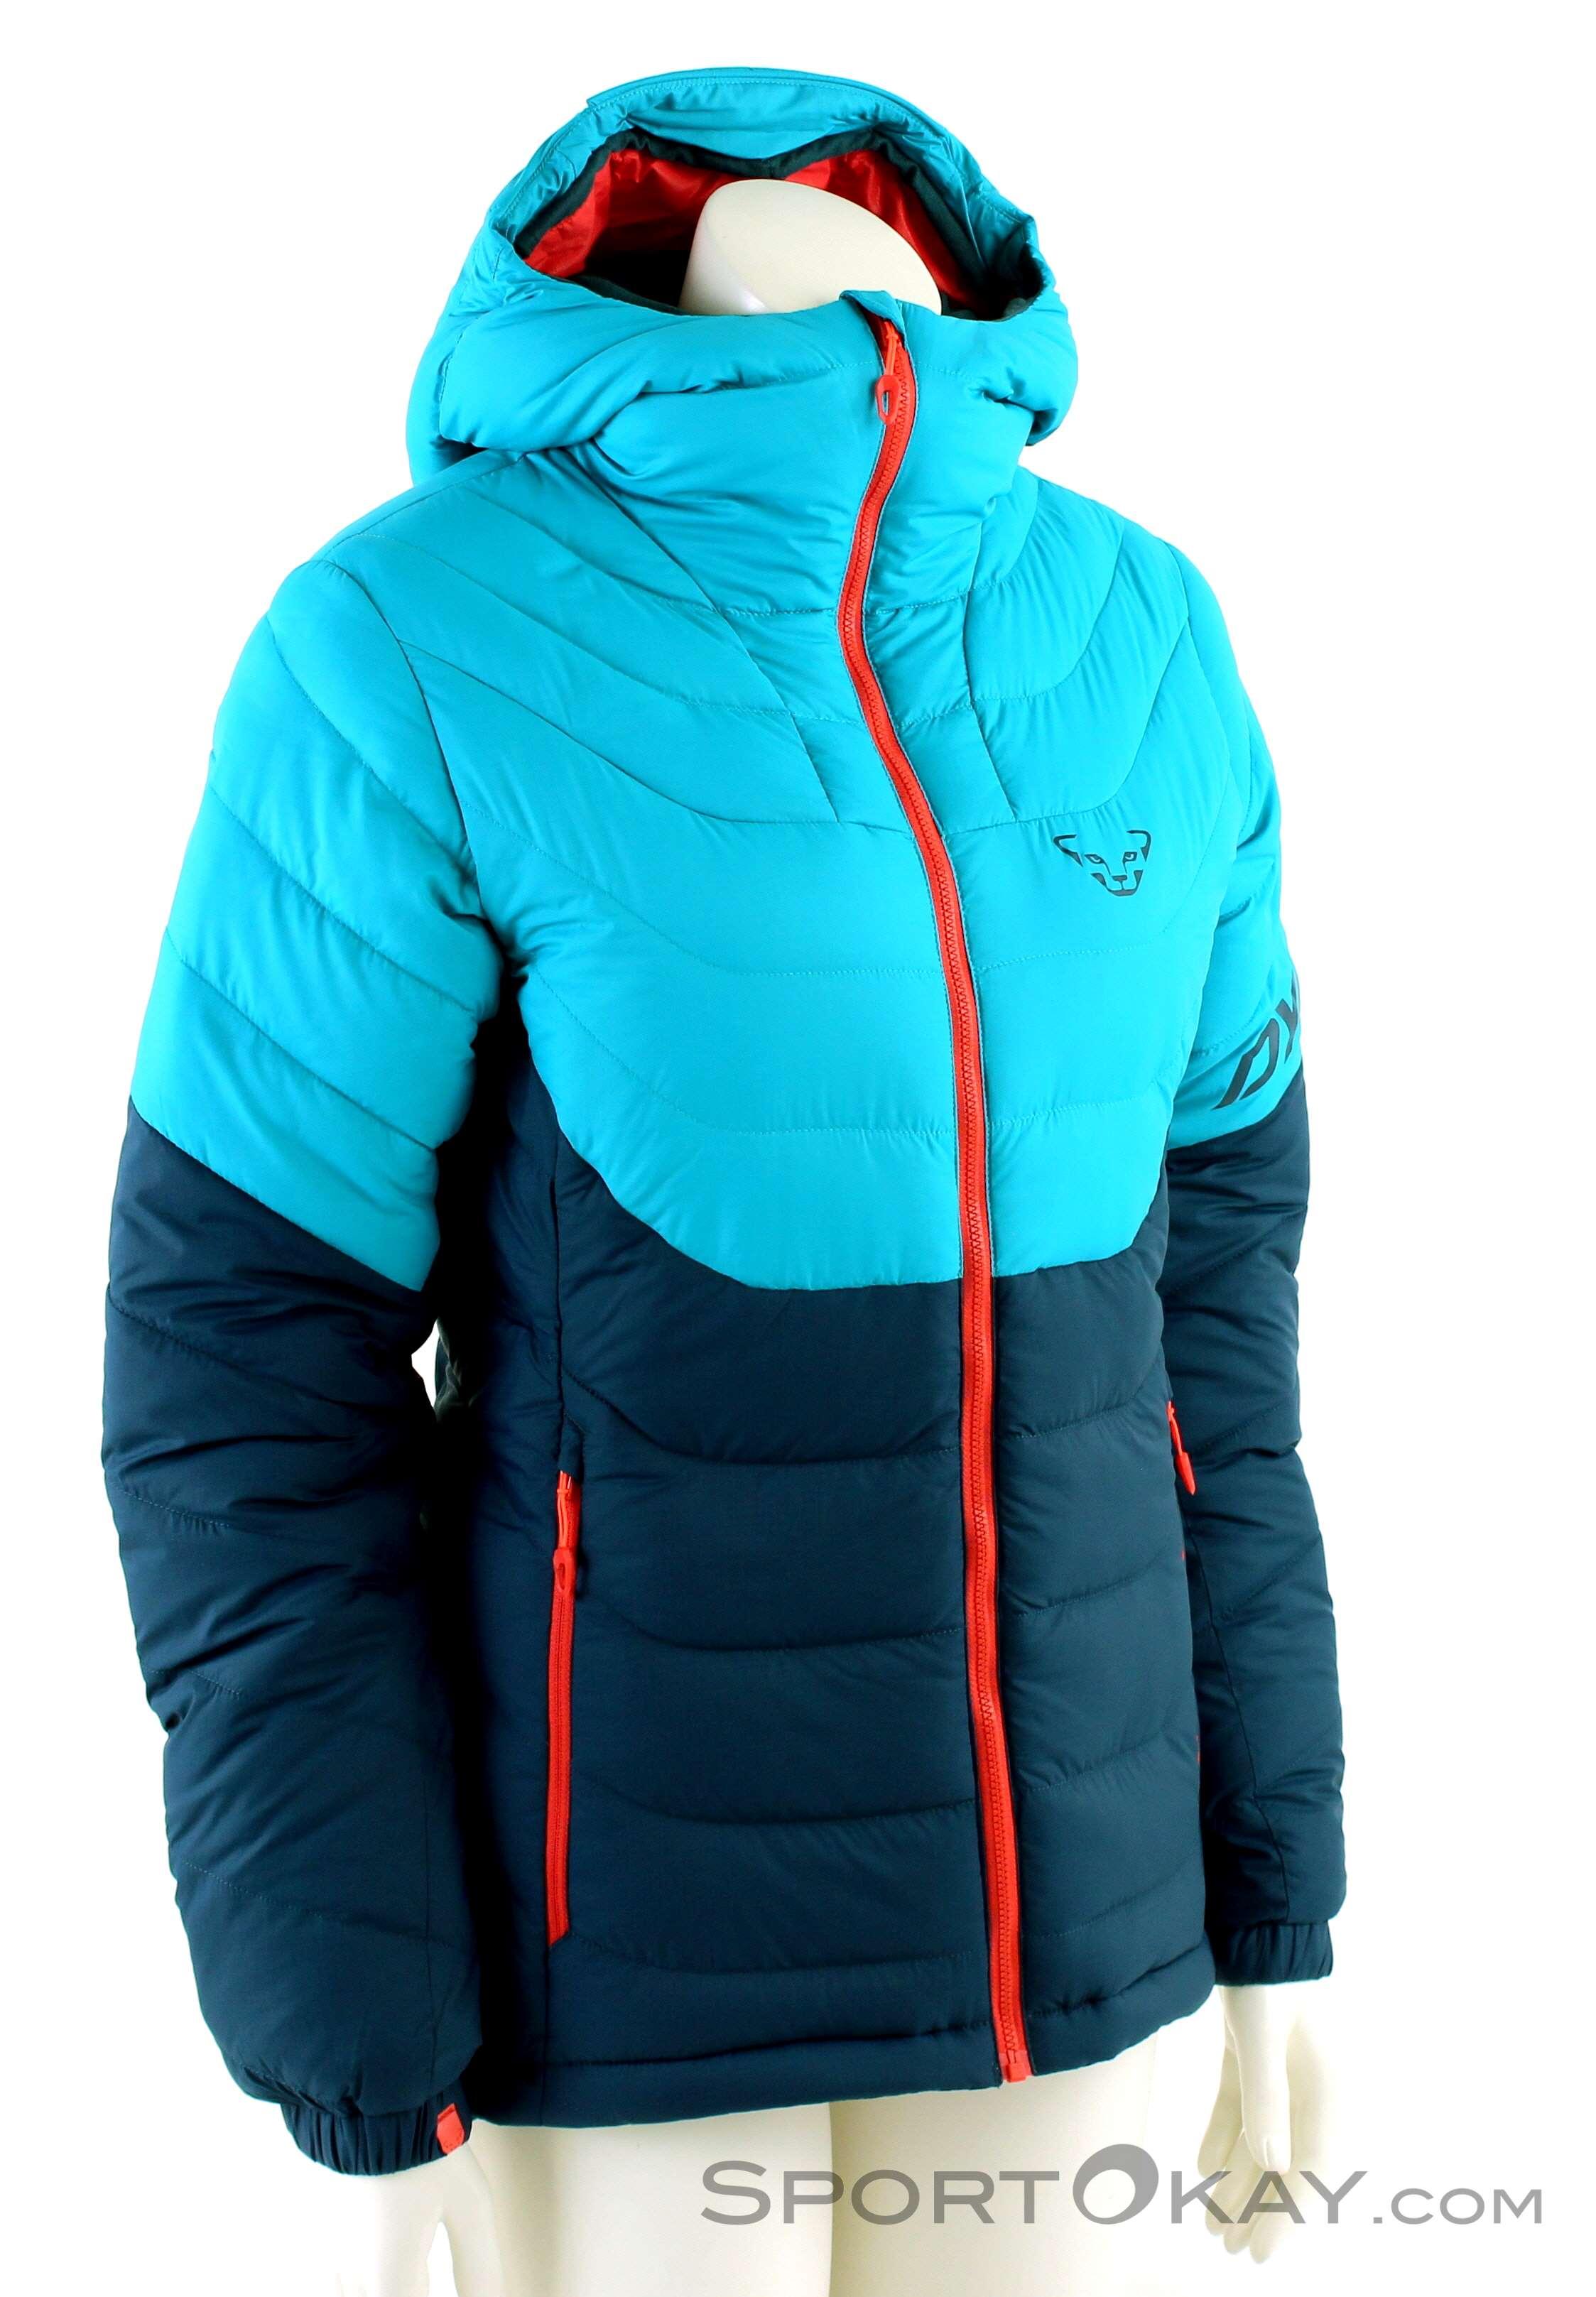 Dynafit Dynafit FT Womens Outdoor Jacket